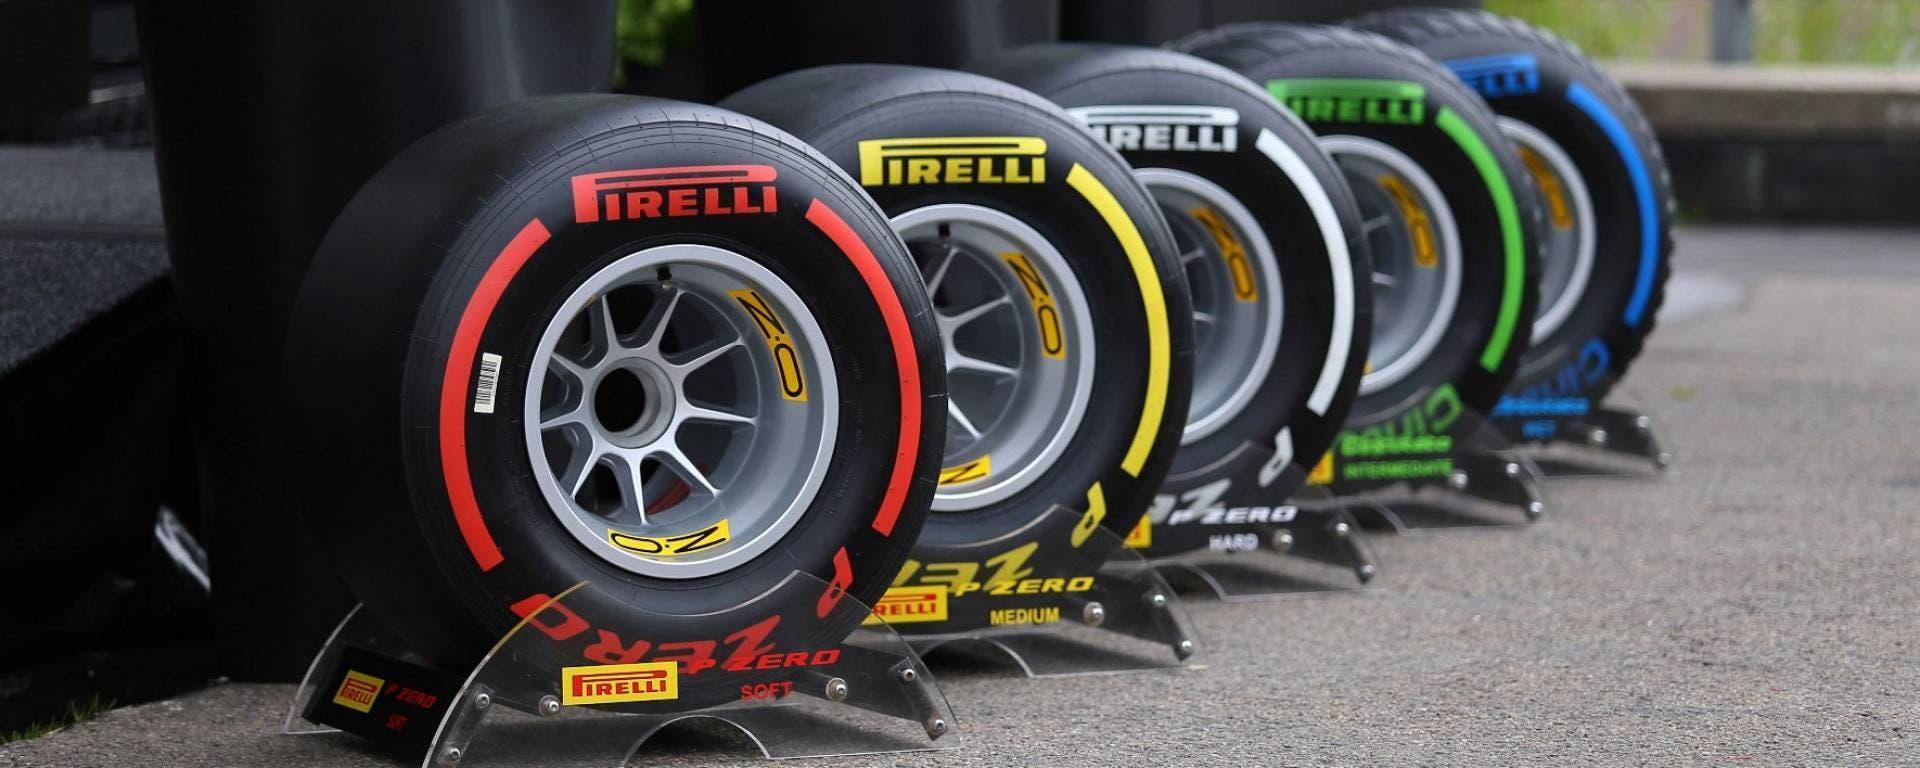 Pirelli - Formula 1